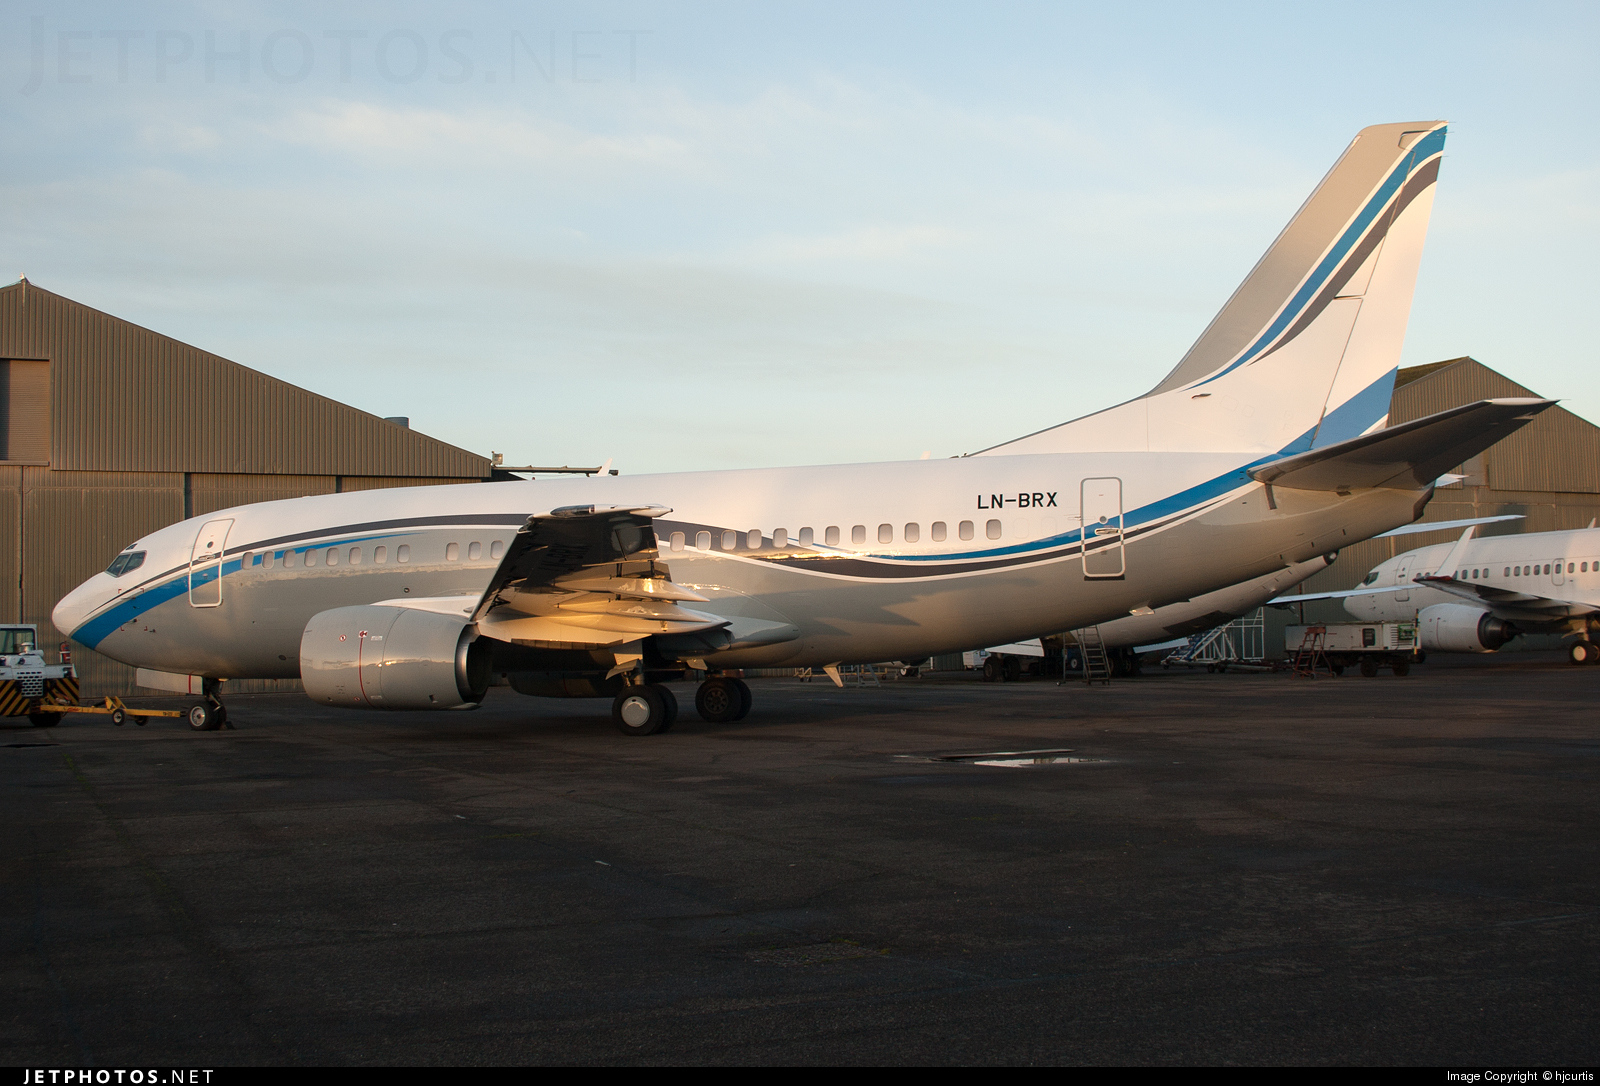 LN-BRX - Boeing 737-505 - Private